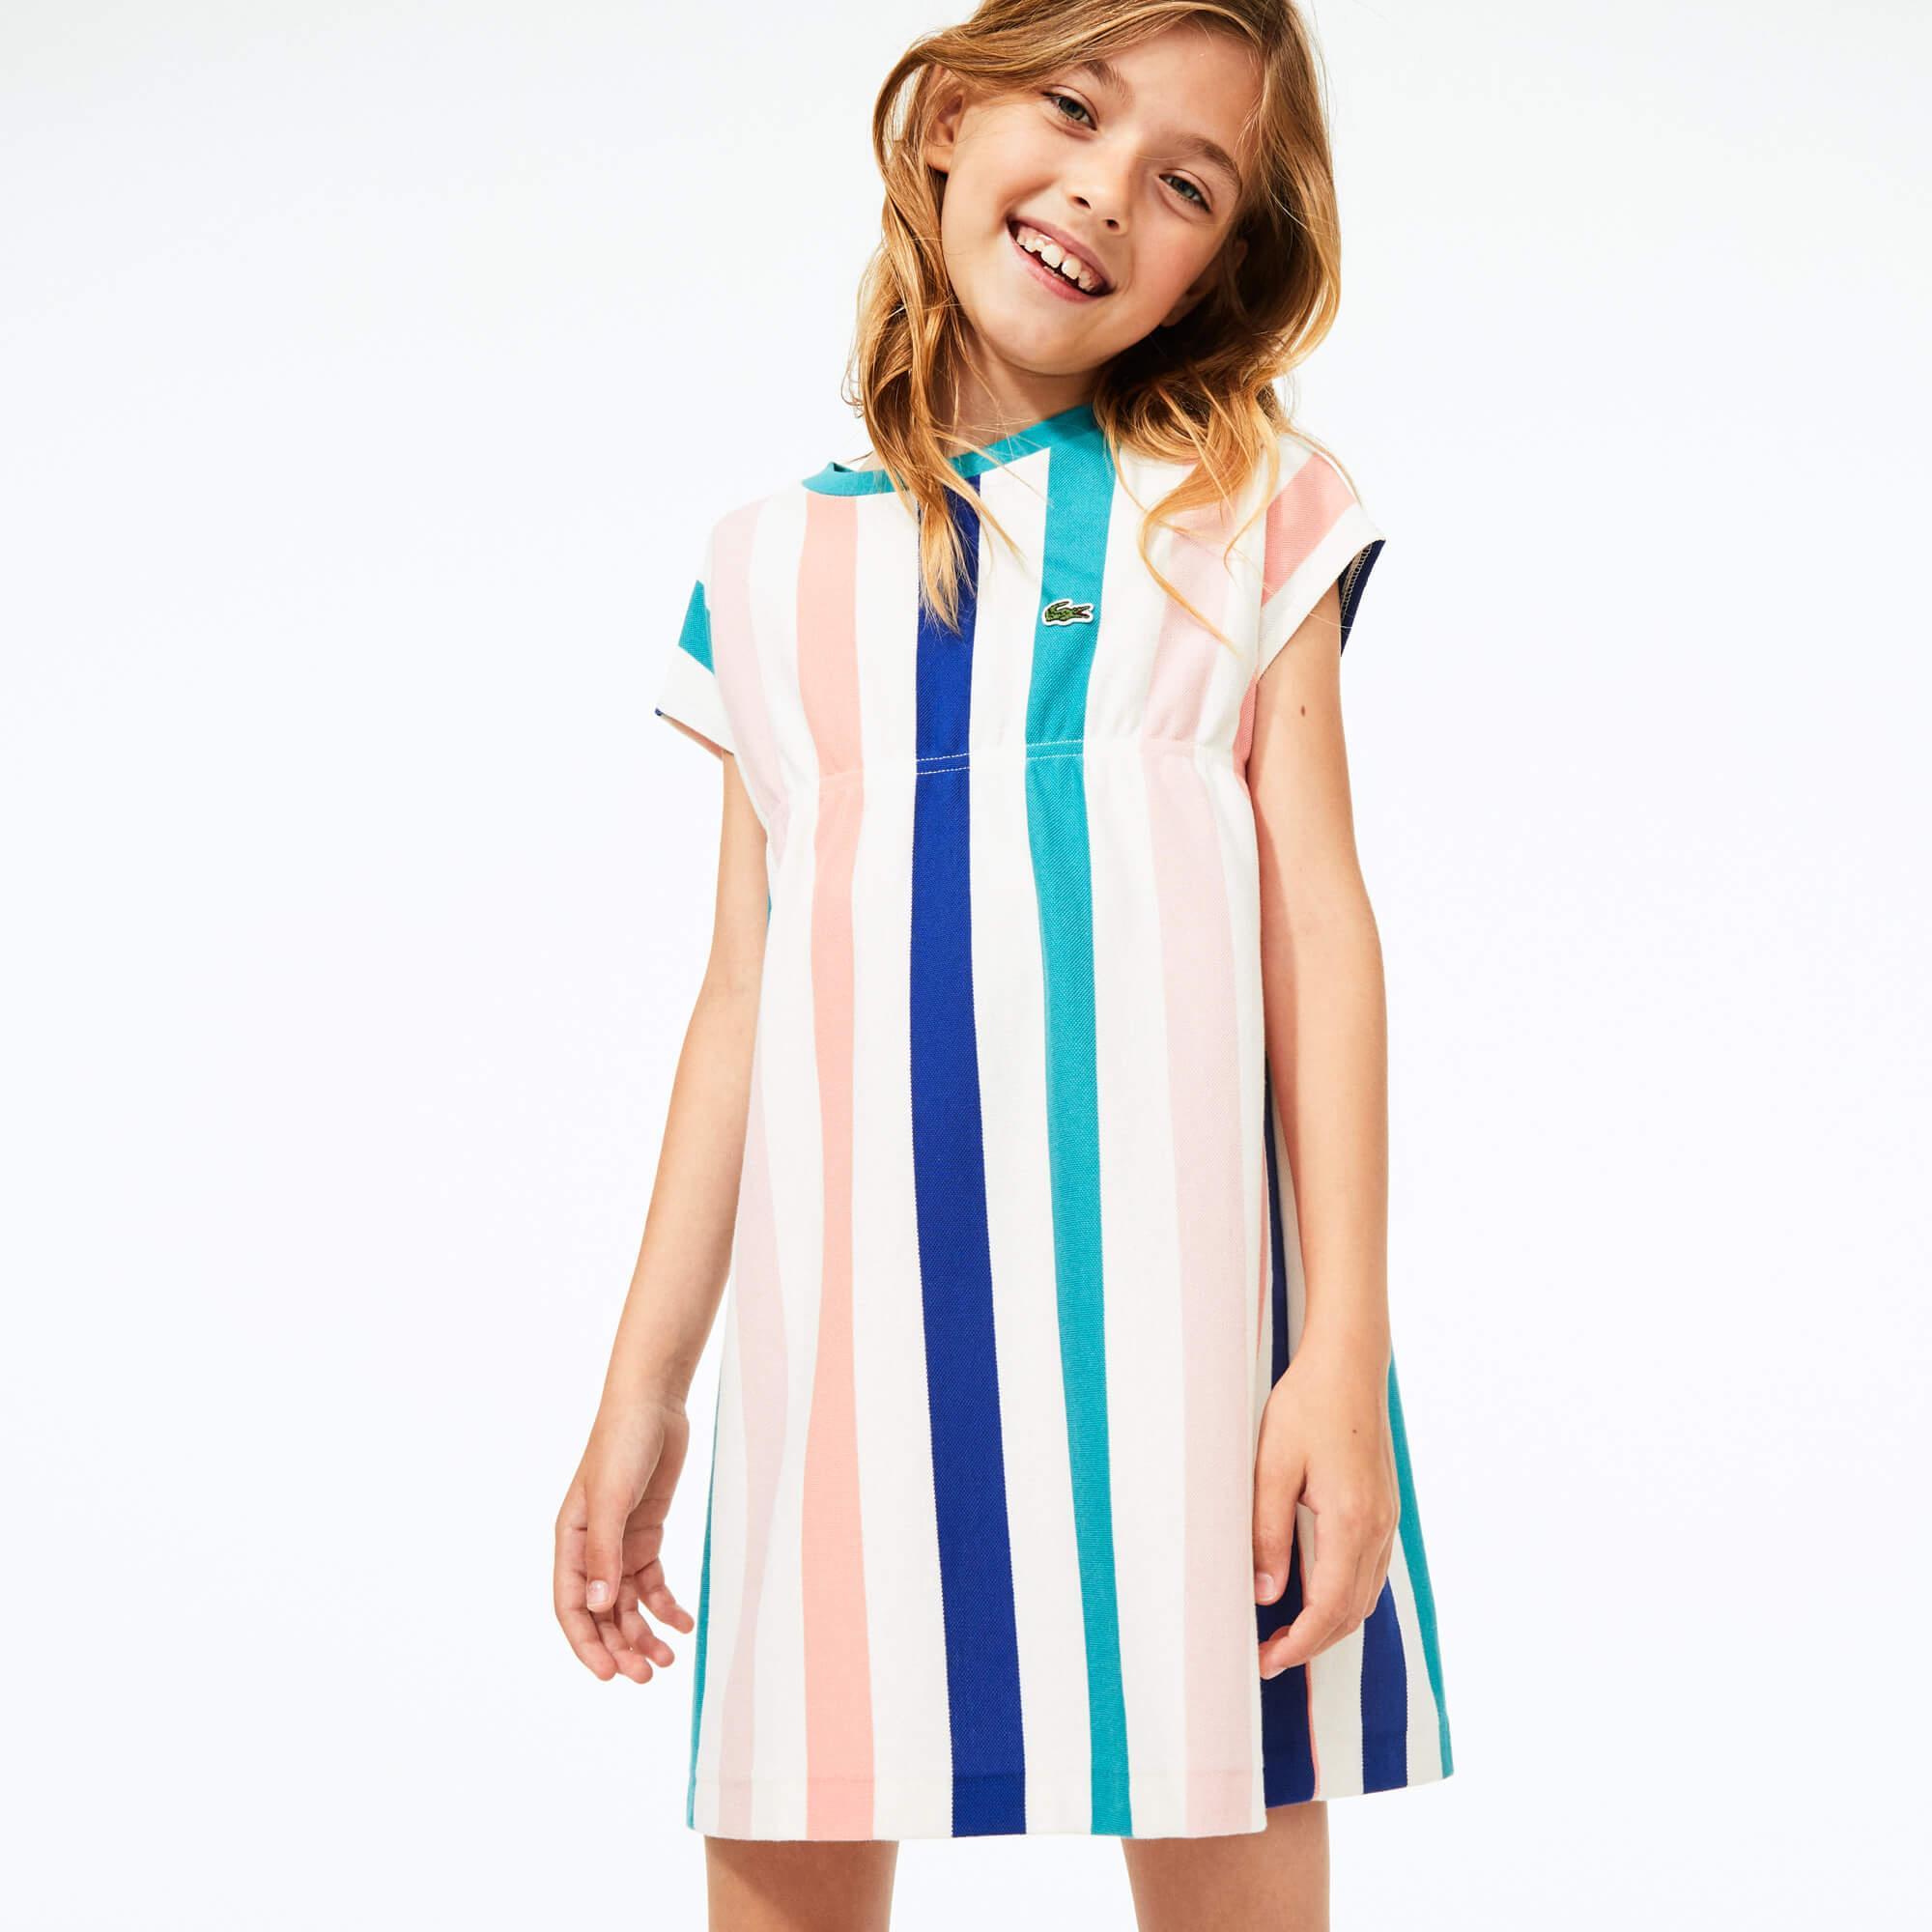 Lacoste Children Dresses